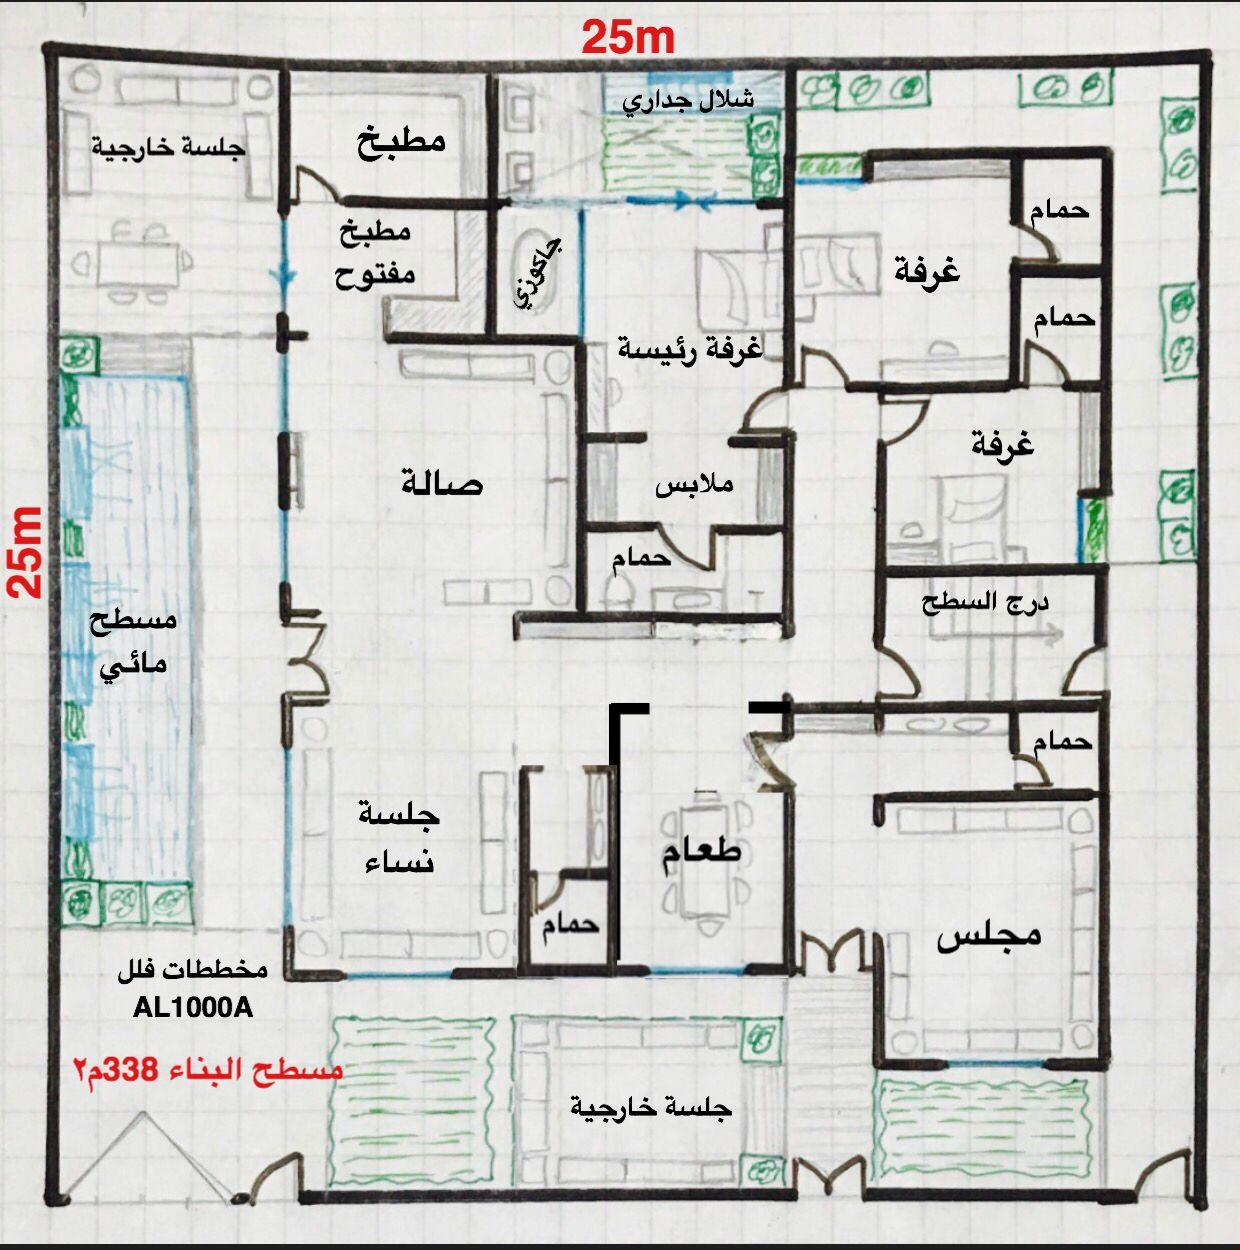 تصاميم معمارية مخطط دور واحد My House Plans Model House Plan Narrow House Plans